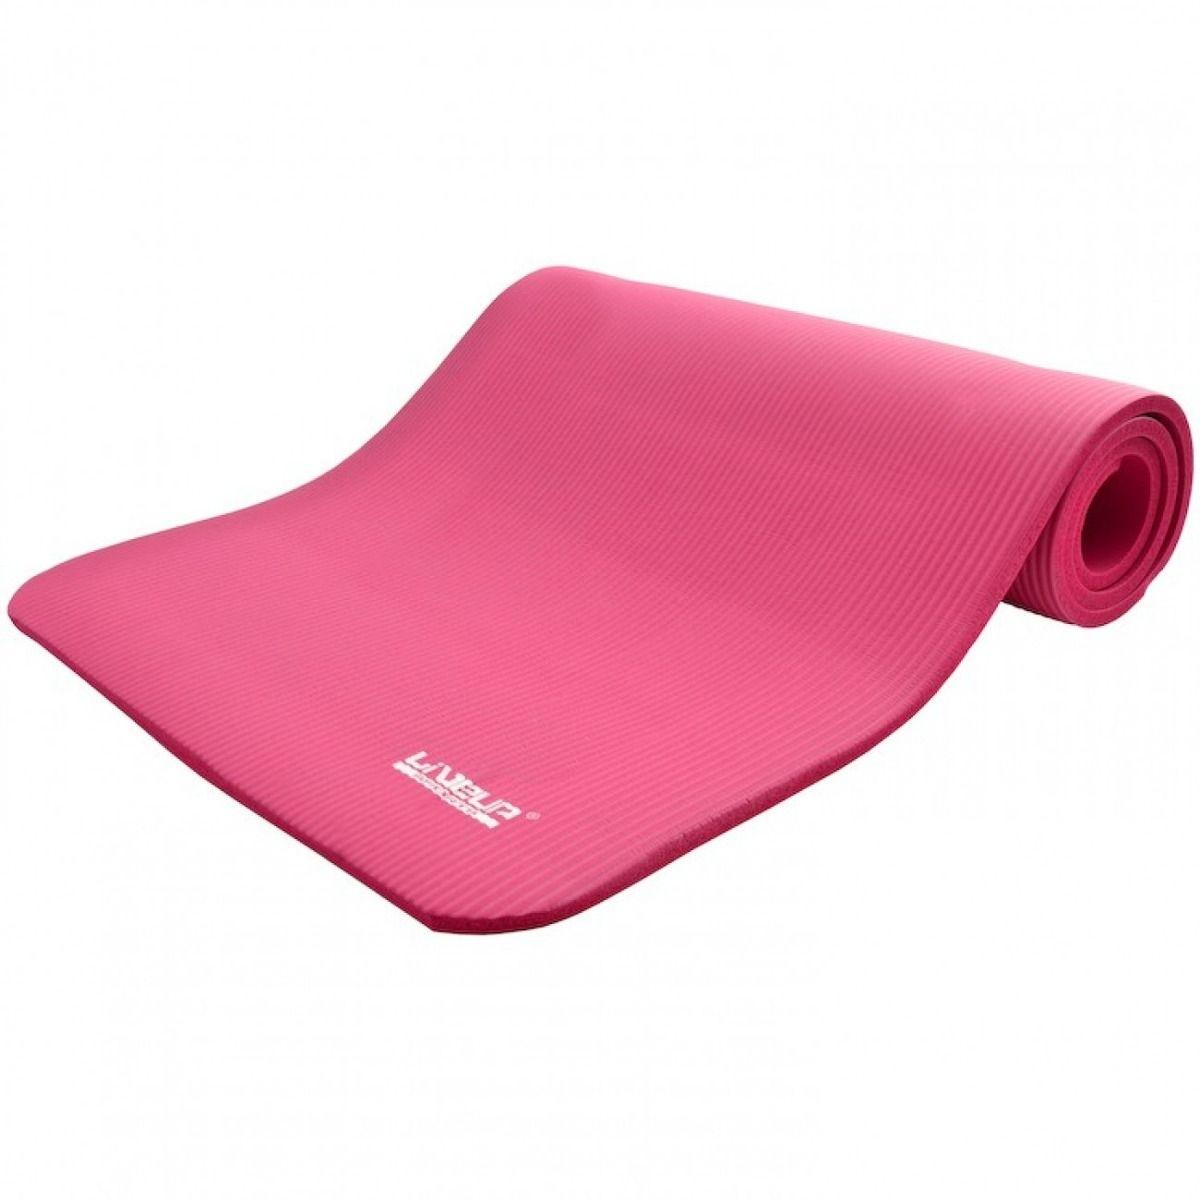 Colchonete Yoga Pilates Liveup - Rosa